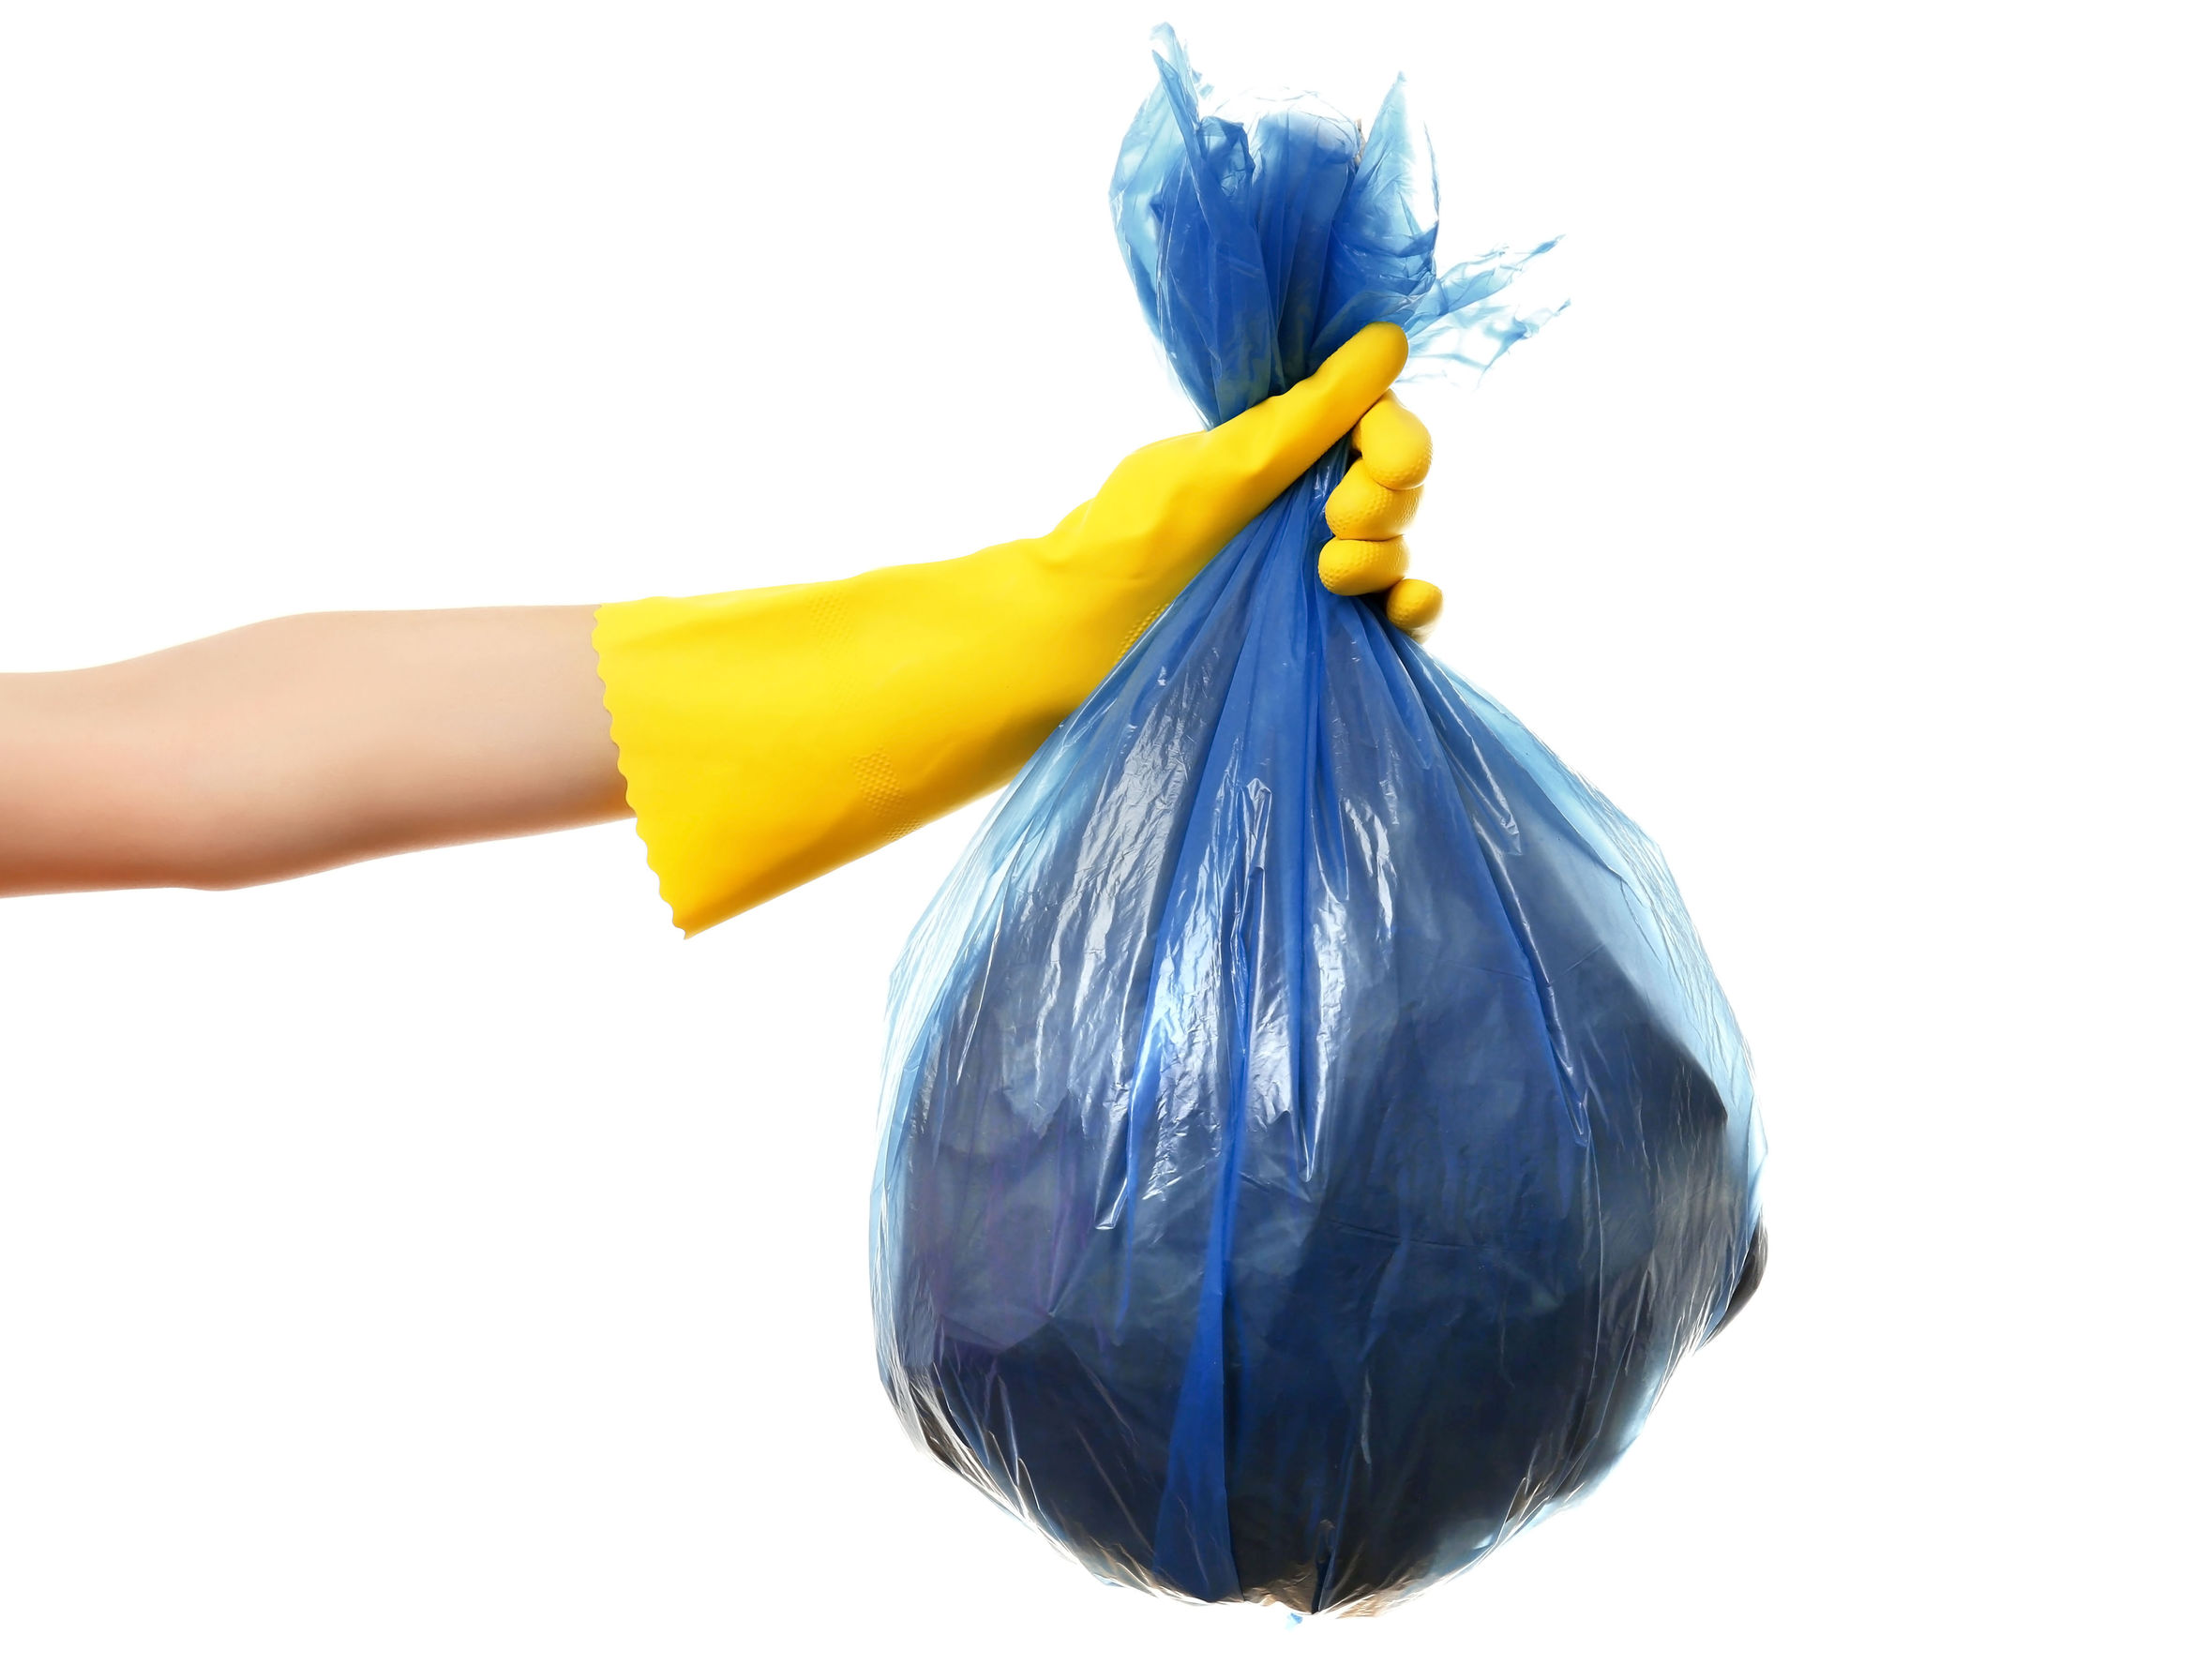 Female hand holding garbage bag, isolated on white